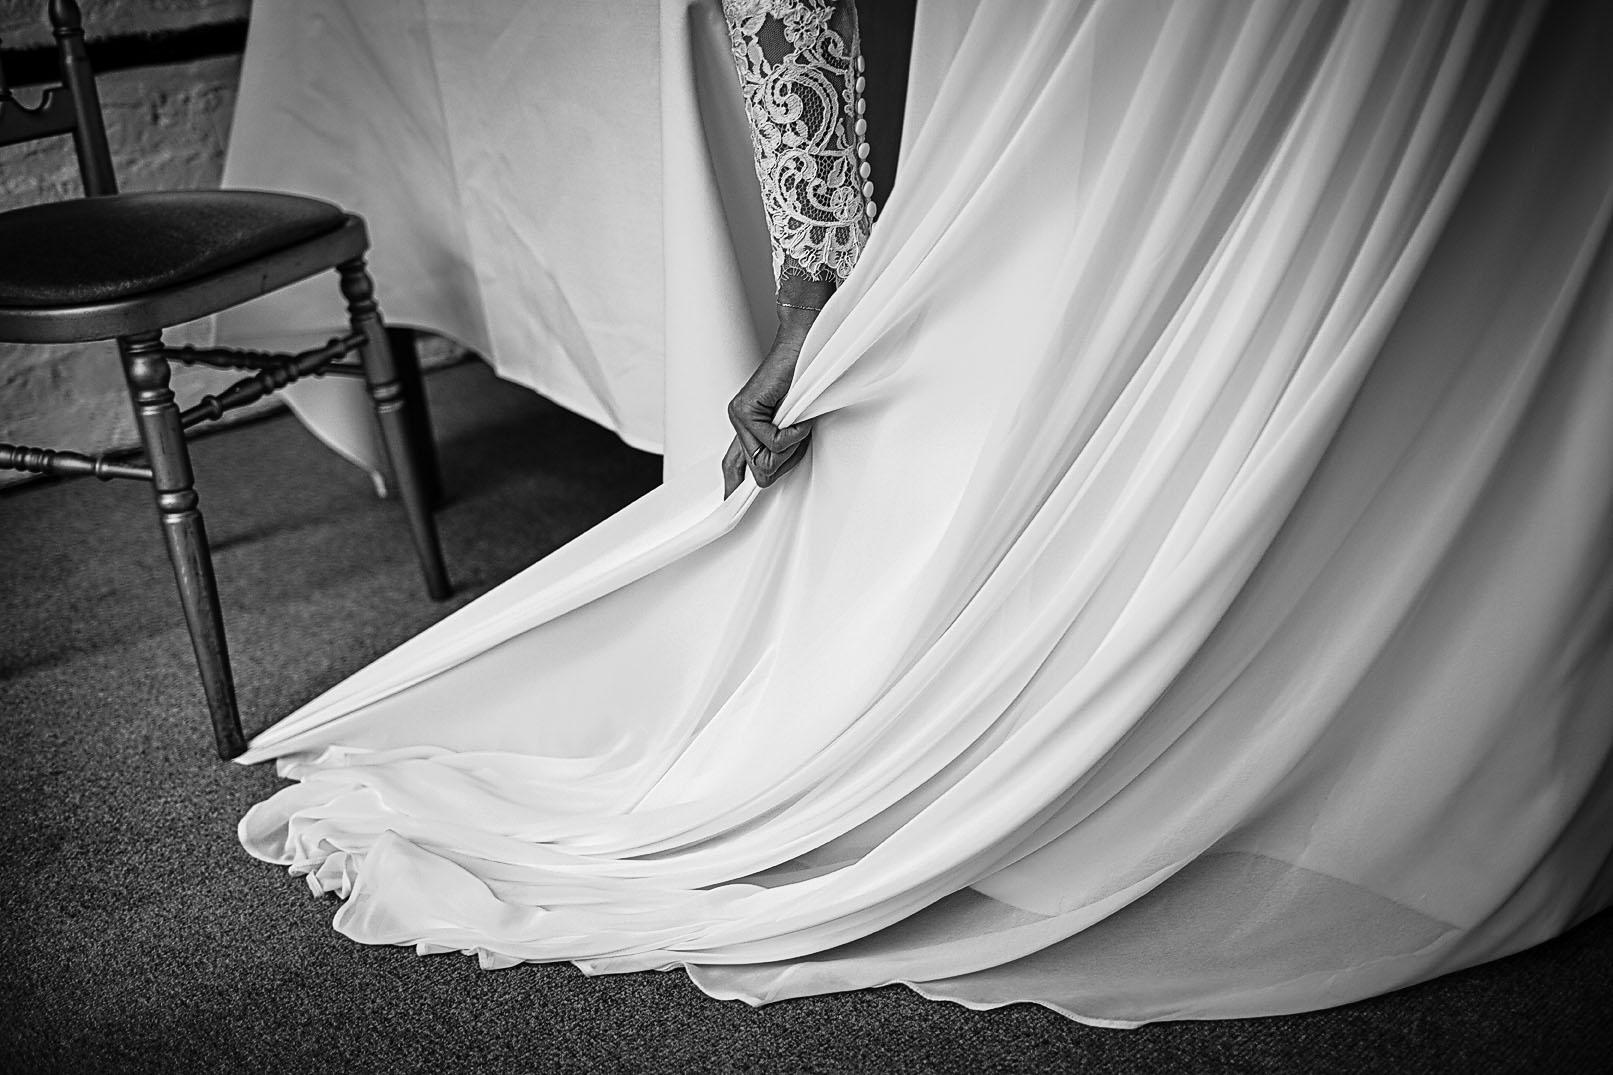 Detail of bride's dress caught underneath a wedding chair's leg.